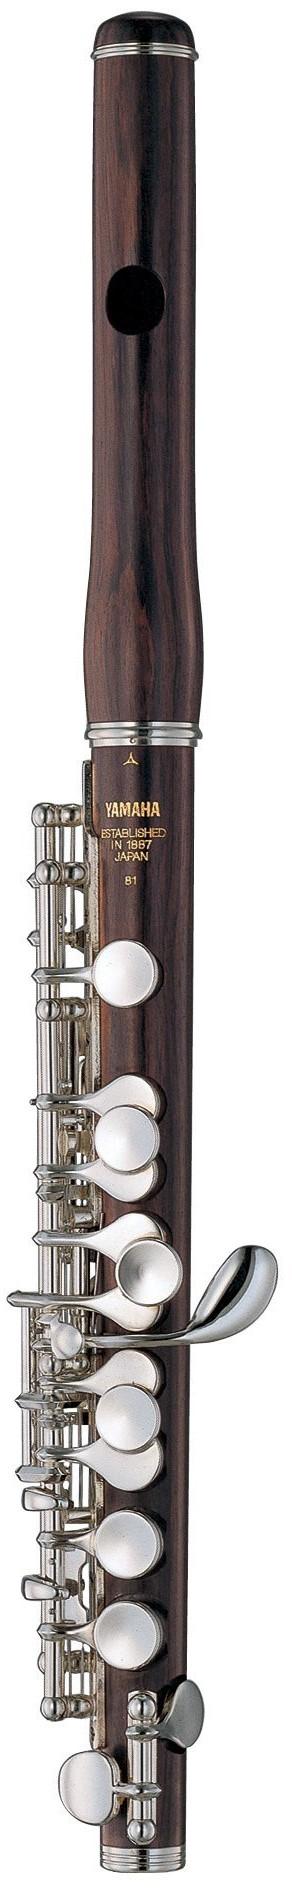 Yamaha - YPC - 81 - HK-G - Holzblasinstrumente - Piccolo-Flöten | MUSIK BERTRAM Deutschland Freiburg